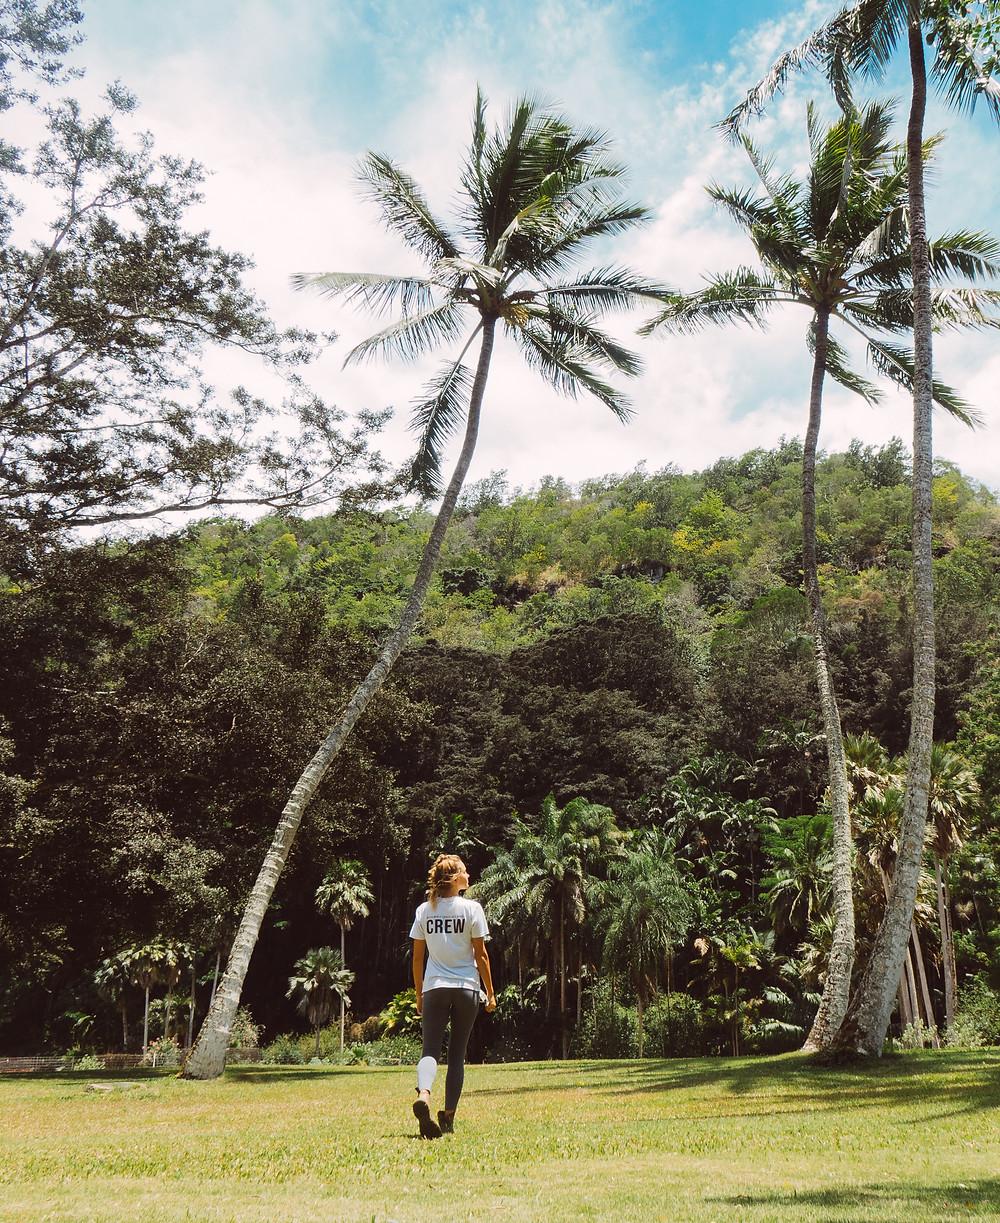 A girl is walking in the jungles. Photograph a volunteer in Waimea Valley, Oahu, Hawaii.